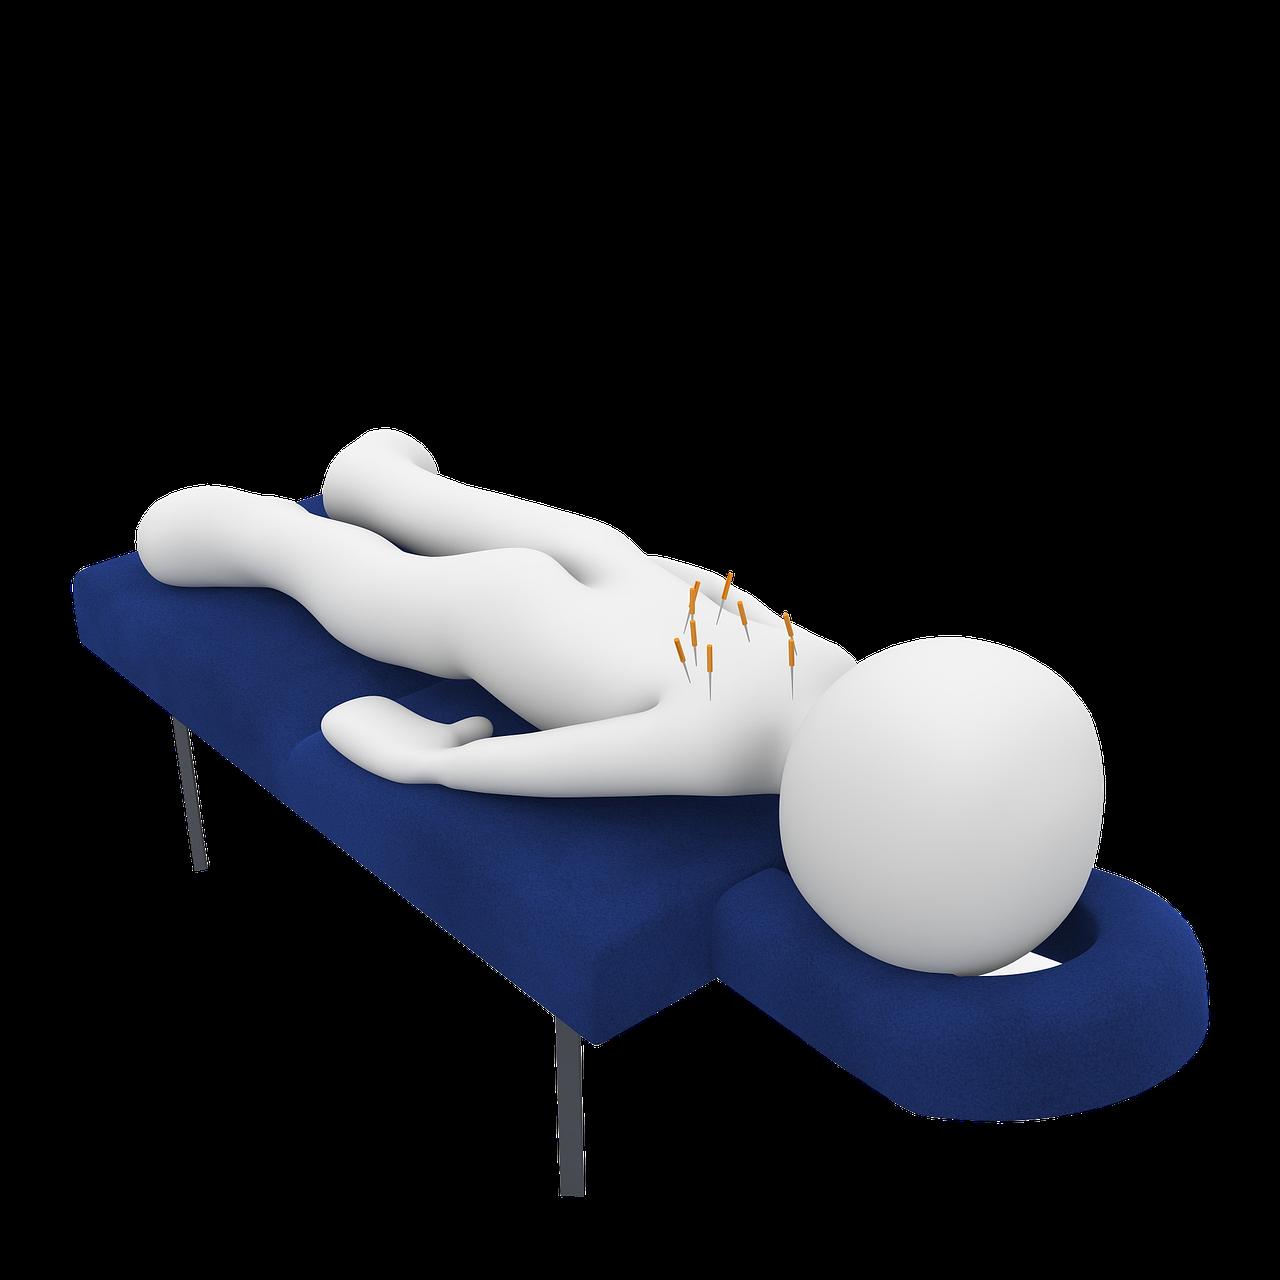 Fysiotherapie Donker Waal en Hilbers massage fysio